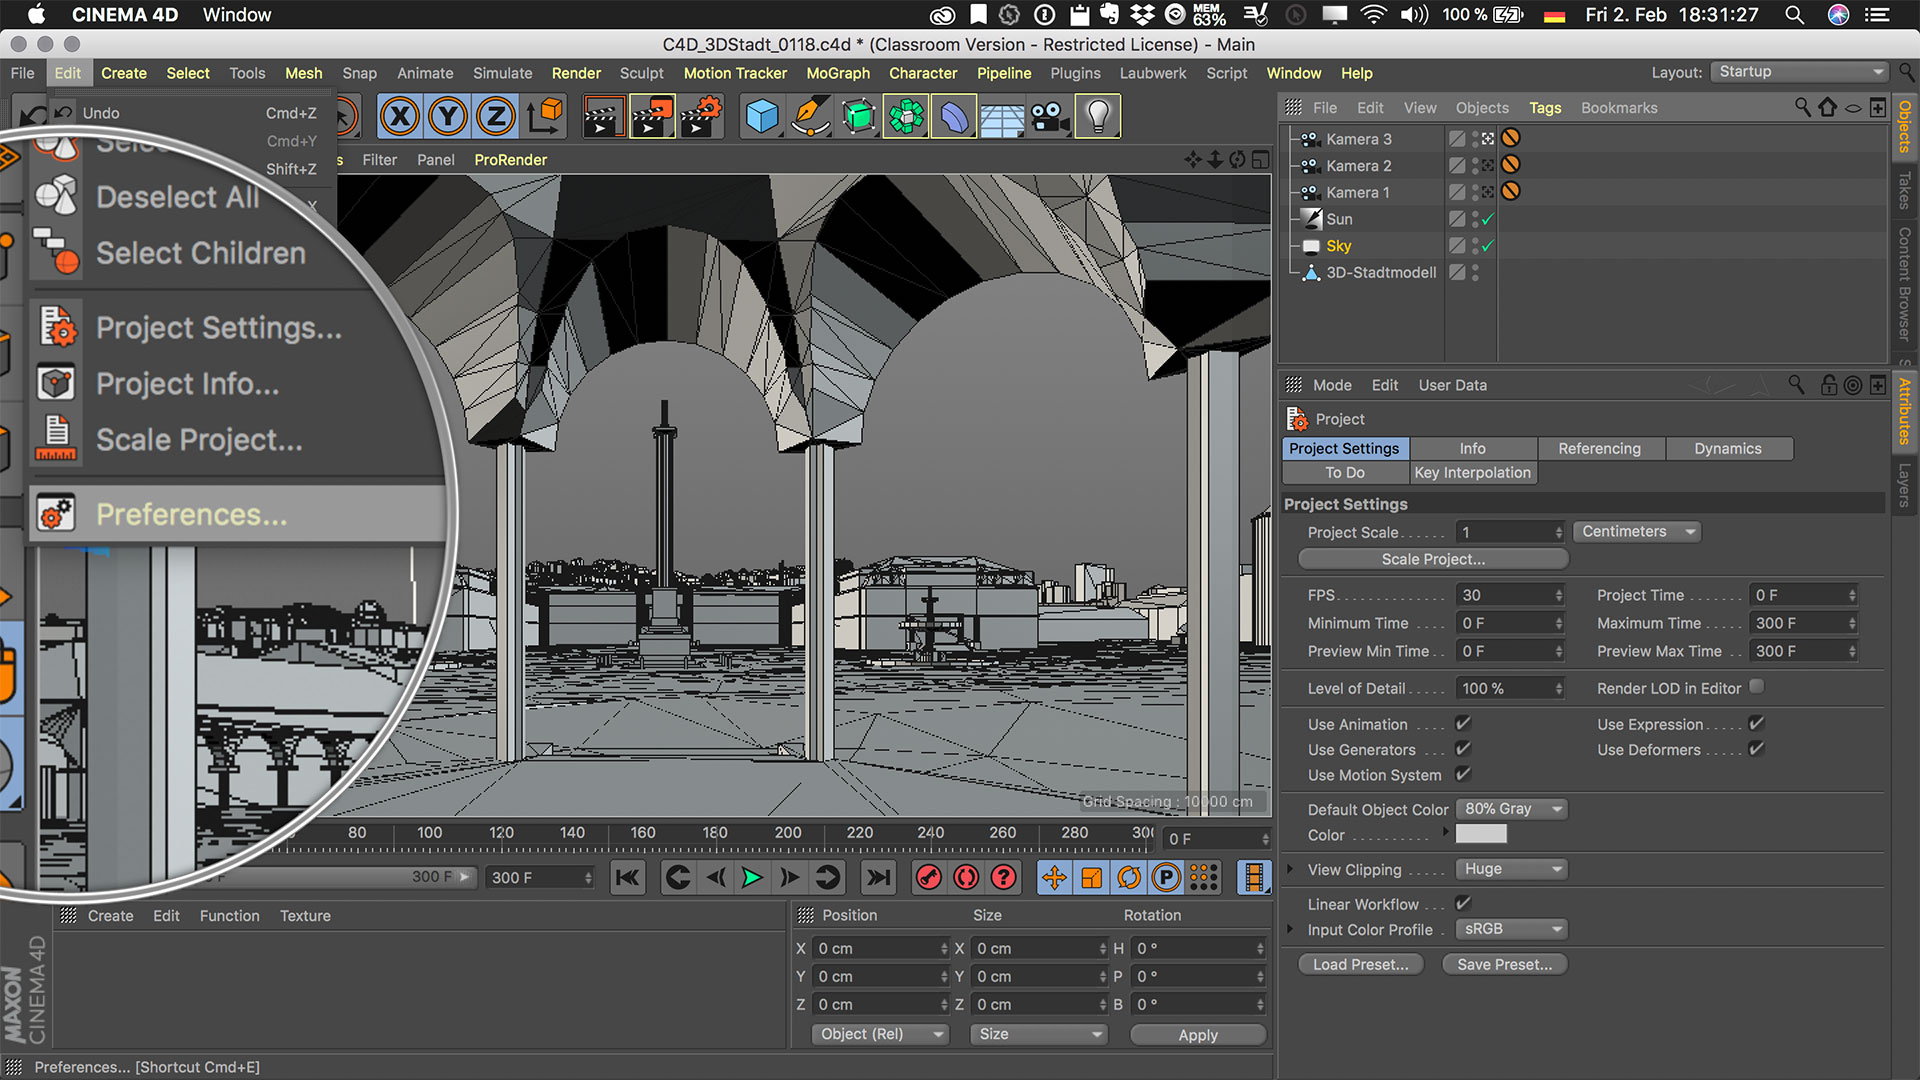 Cinema4D 3D-Stadtmodell Preferences Voreinstellungen Edit Bearbeiten Menü